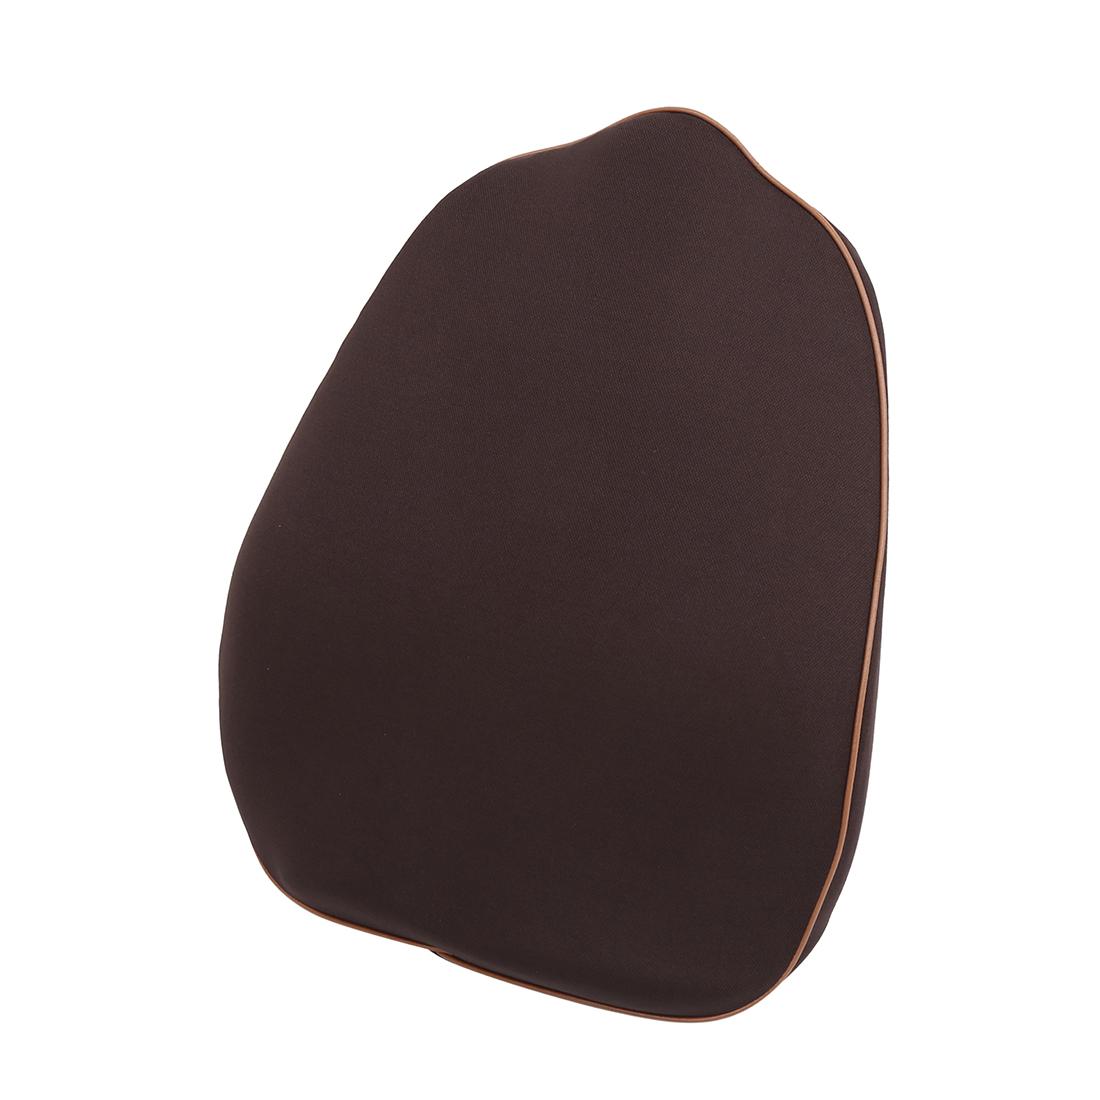 Car Seat Back Lumbar Support Pillow Balanced Softness Memory Foam Cushion Brown